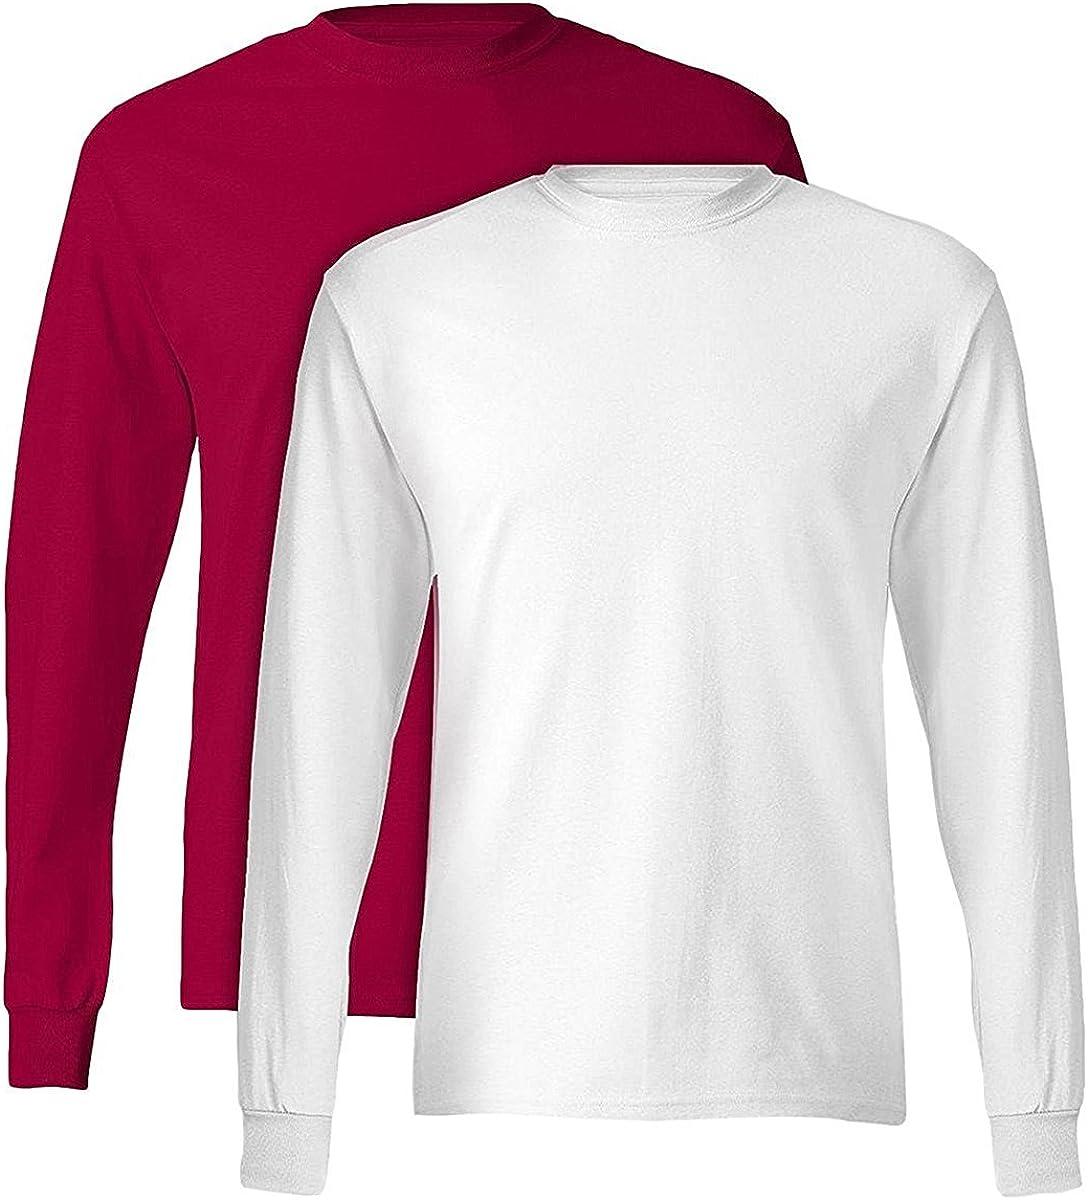 Hanes Tagless Long-Sleeve T-Shirt (Set of 2) 1 Deep Red + 1 White